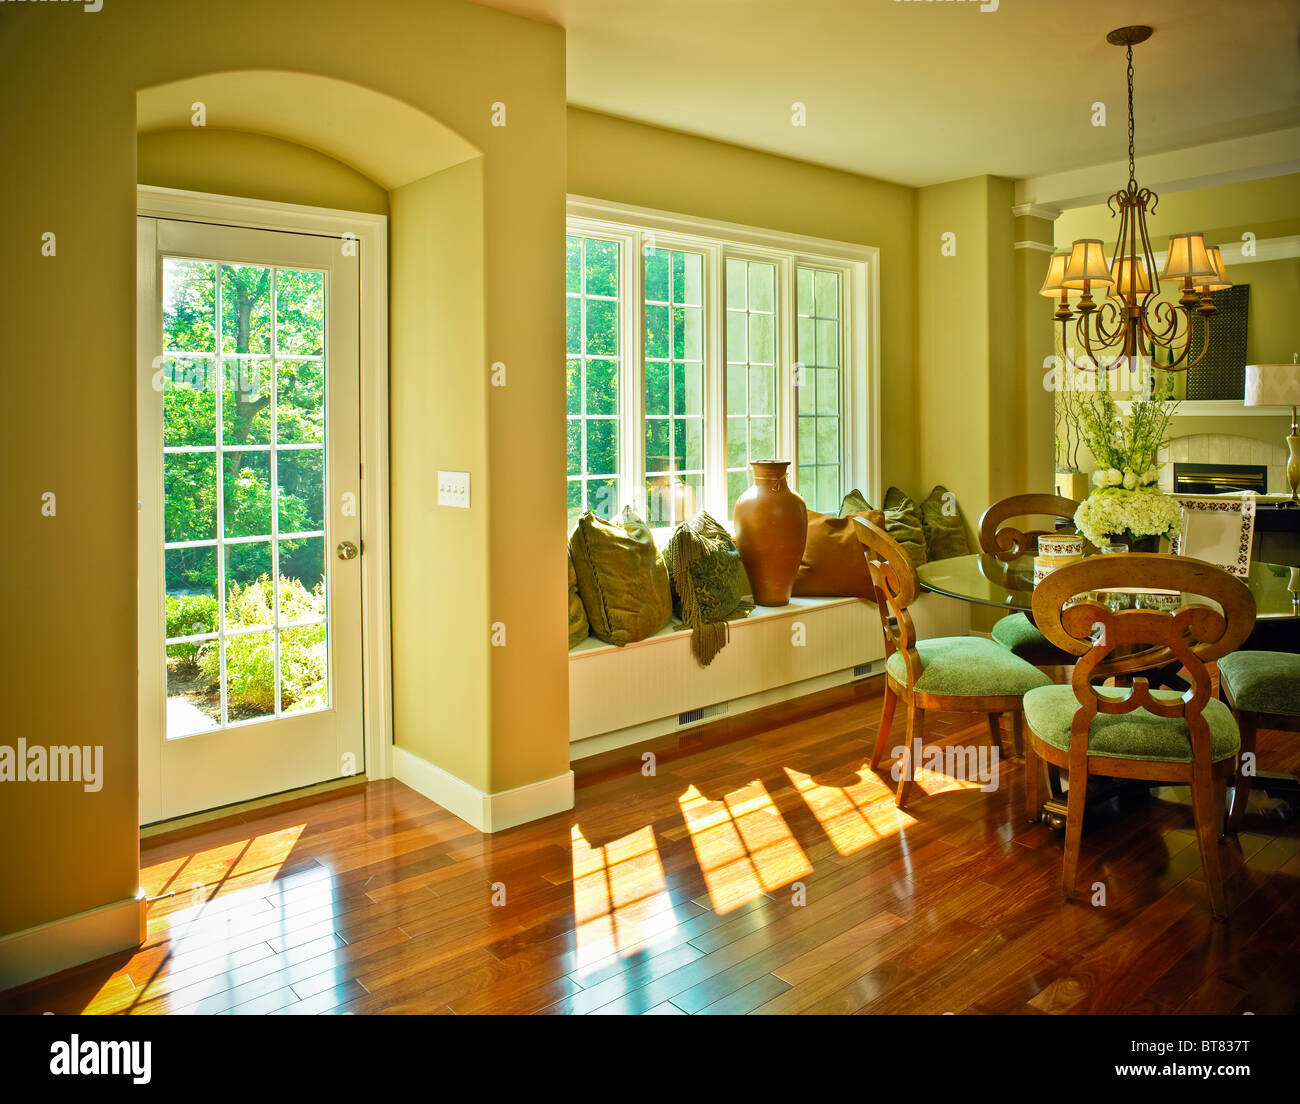 dining room french door alcove window vases hardwood flooring – French Doors Dining Room